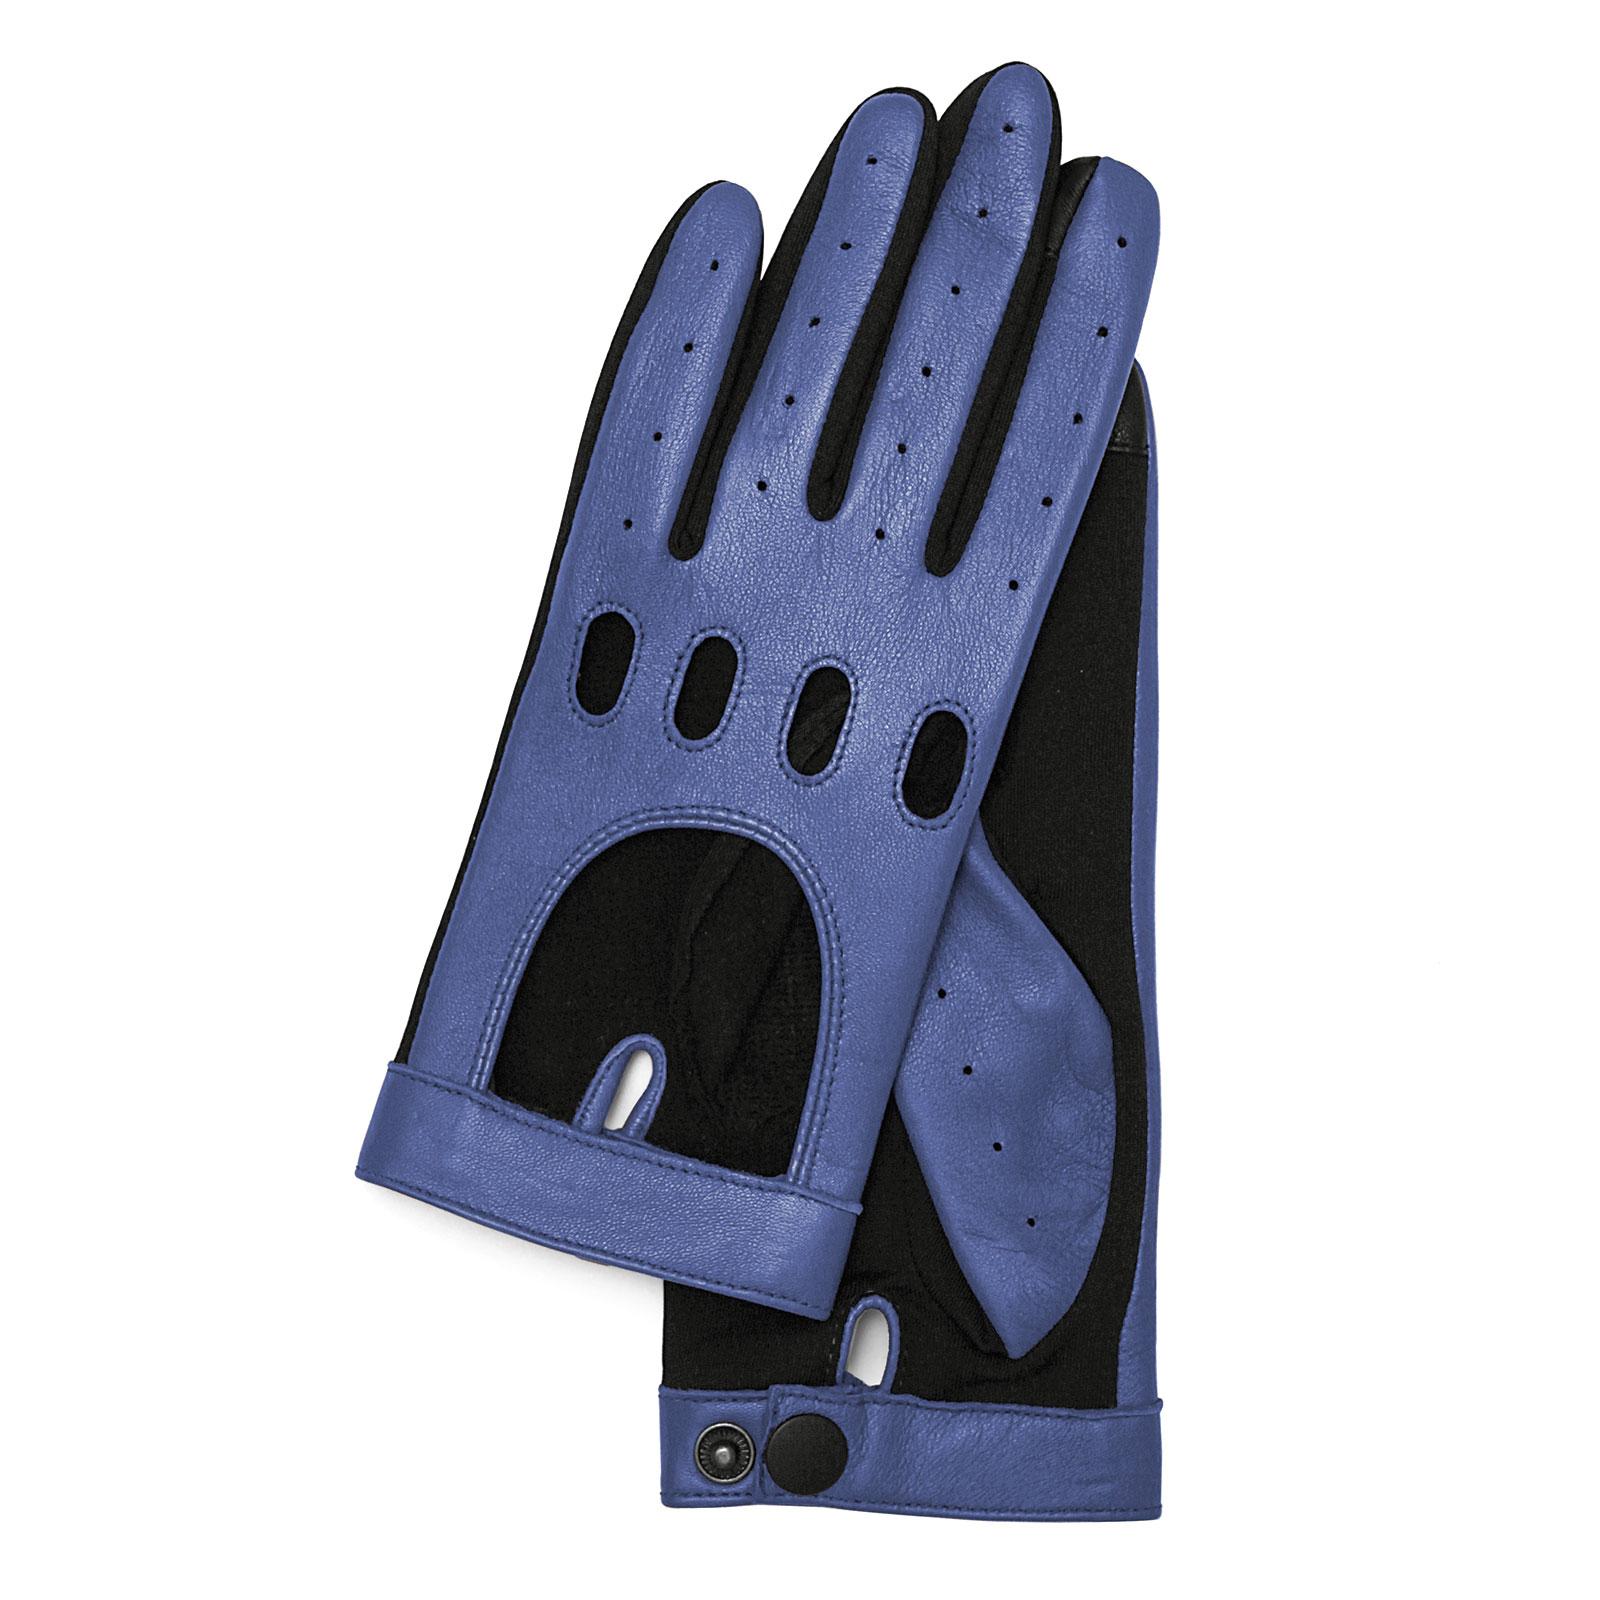 Mia Driver's Glove denim blue 184